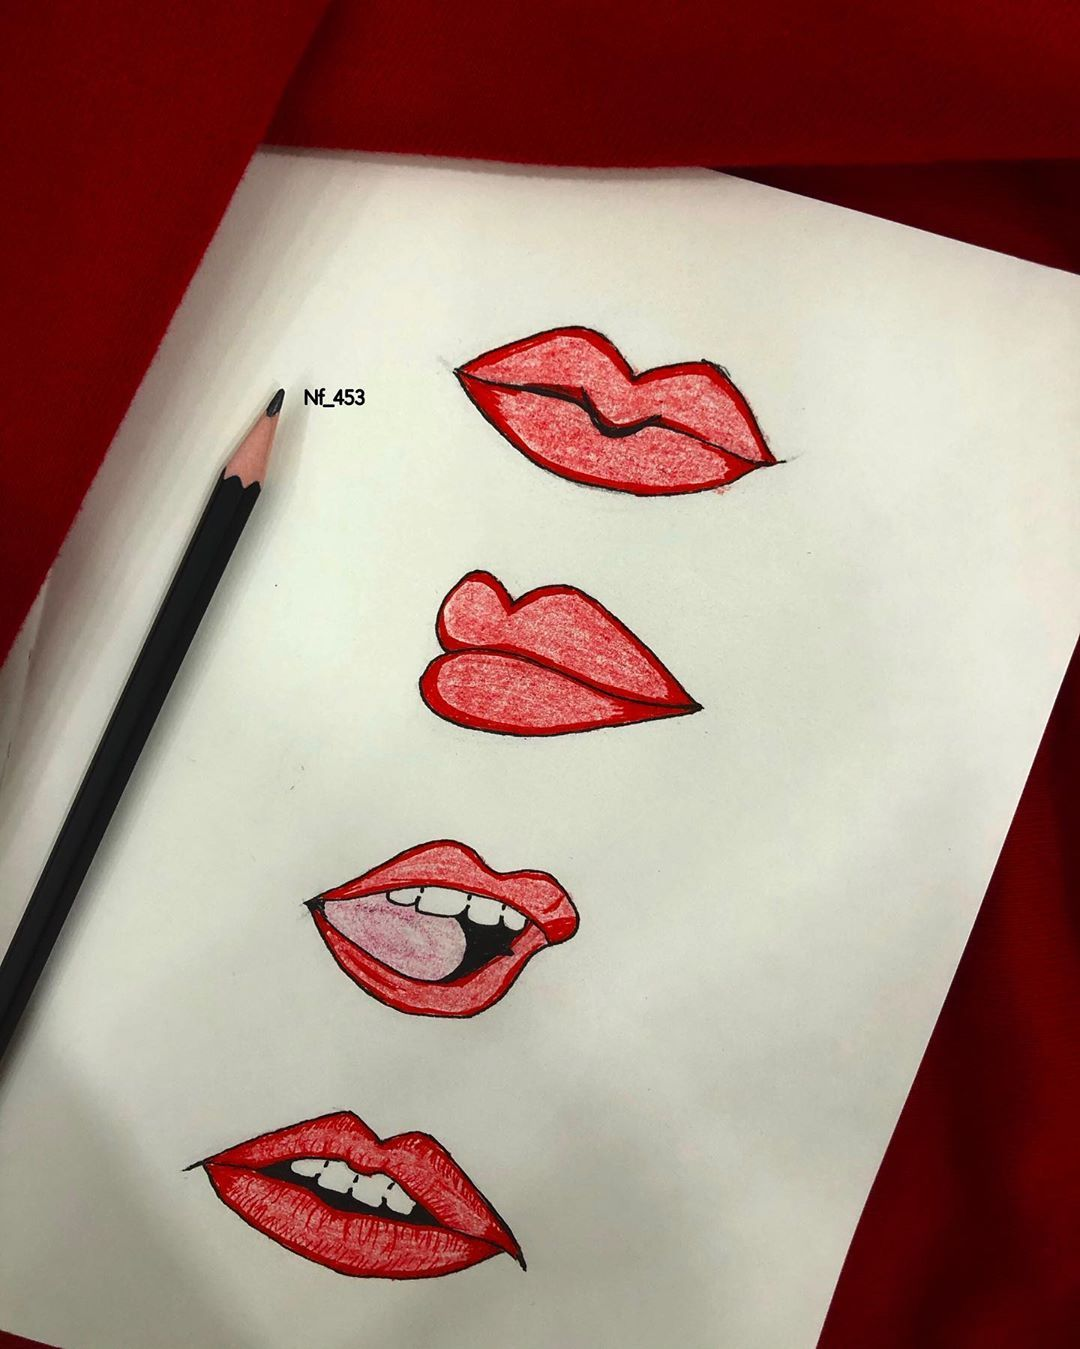 رسم رسمتي رسومات رصاص فن تصويري خلفيات رسم شفايف صوره عبارات خواطر اكسبلور Explore My Dr Triangle Tattoo Lucky Girl South Film